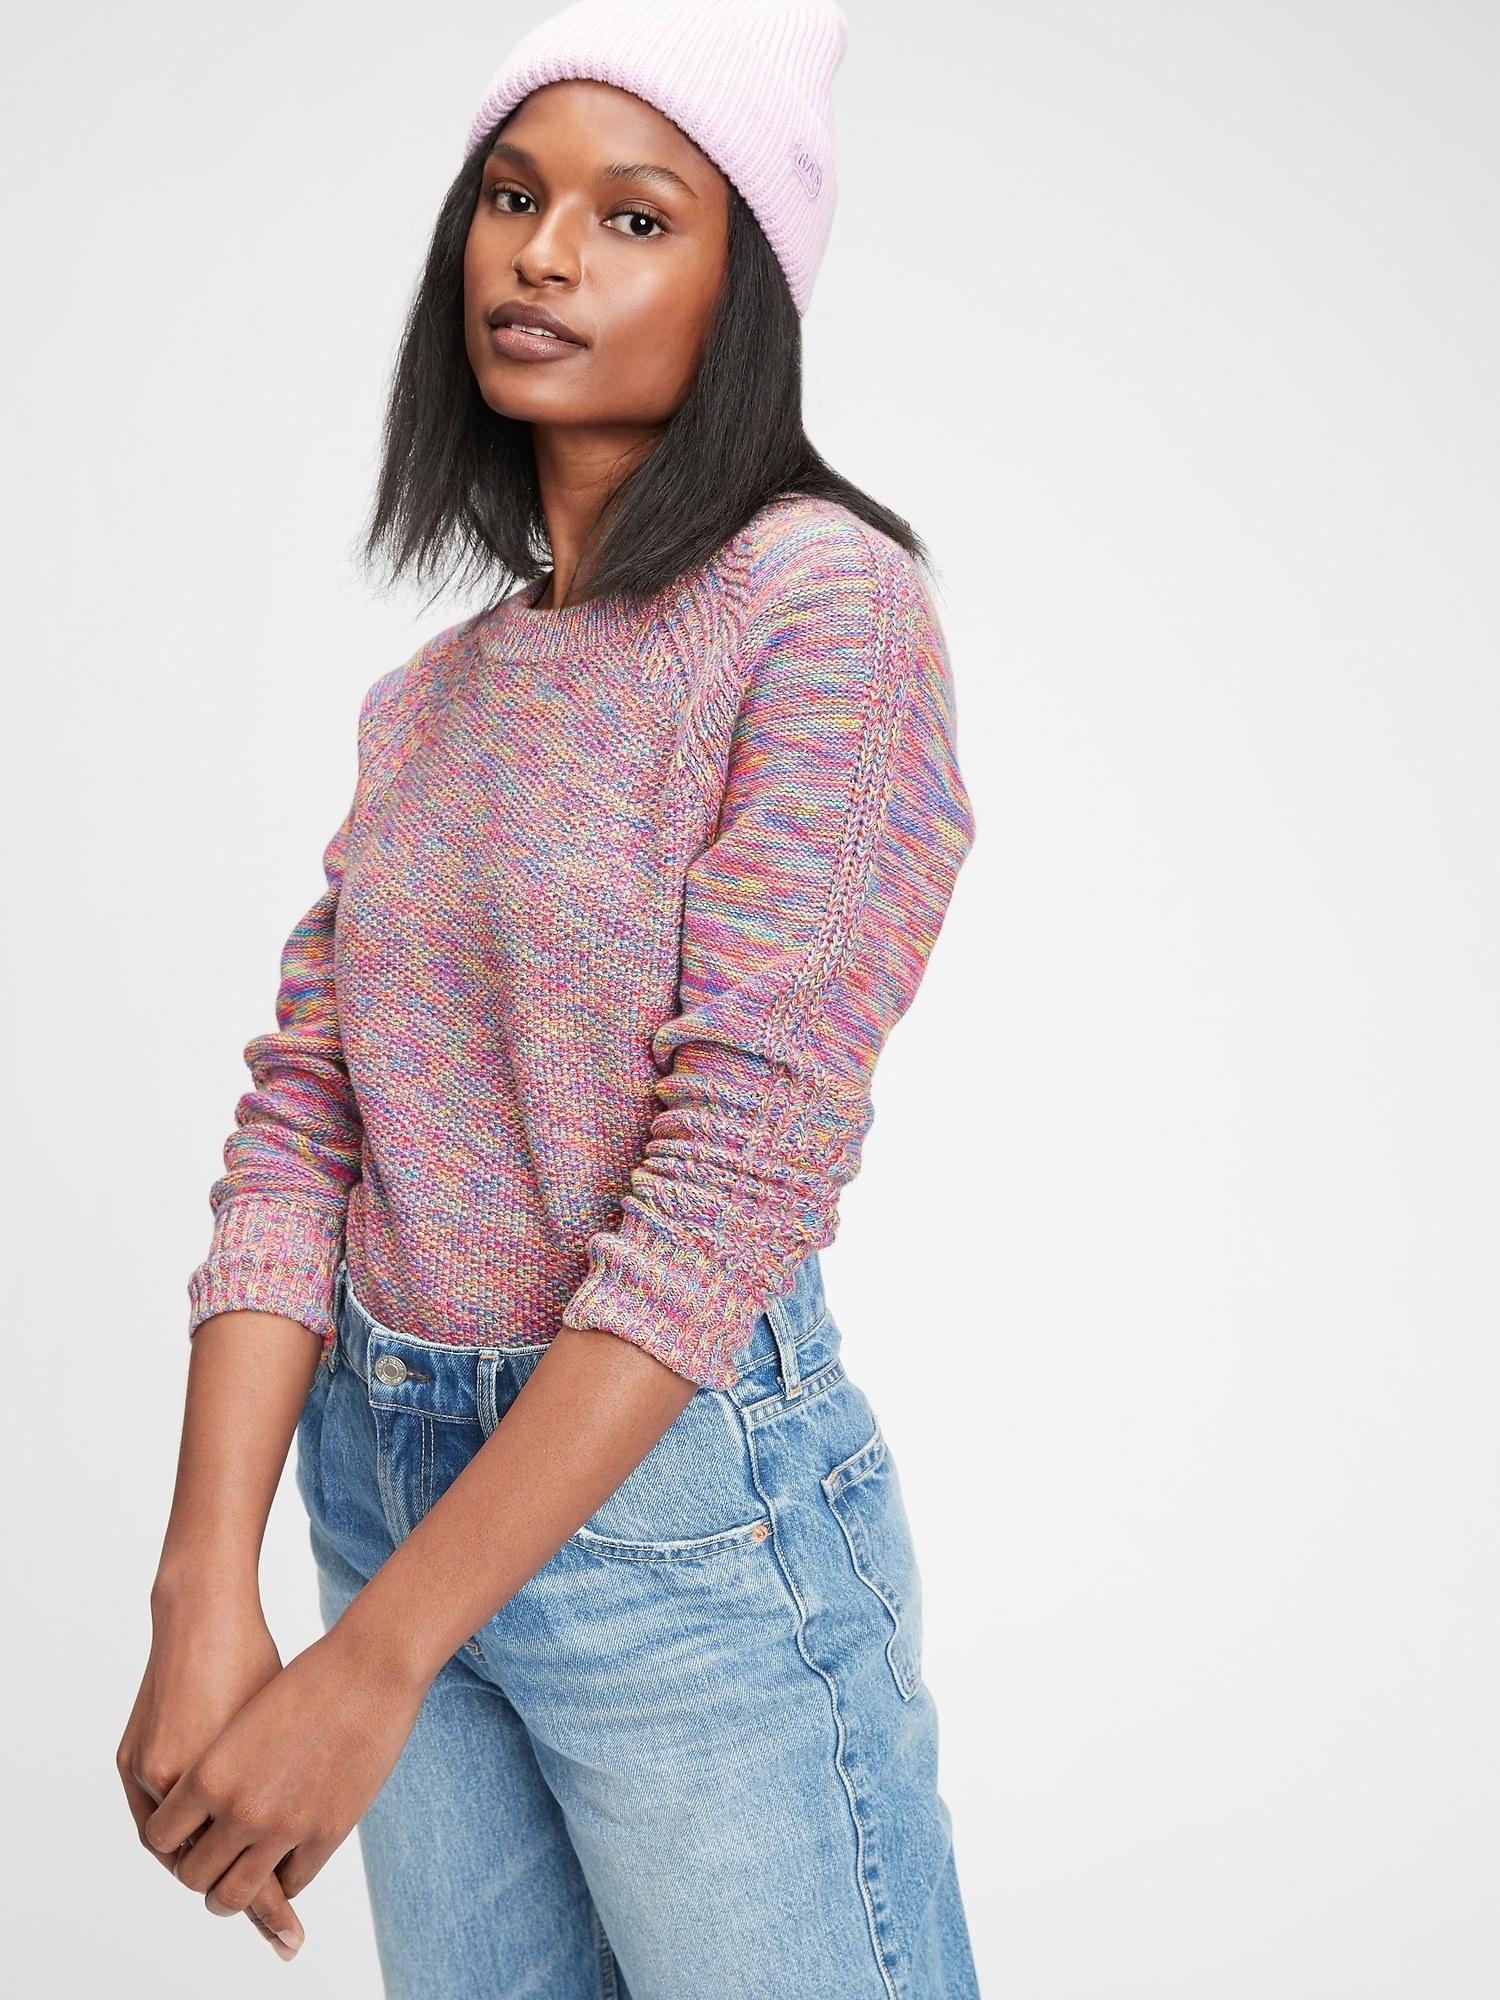 model wearing textured crewneck sweater in multicolor